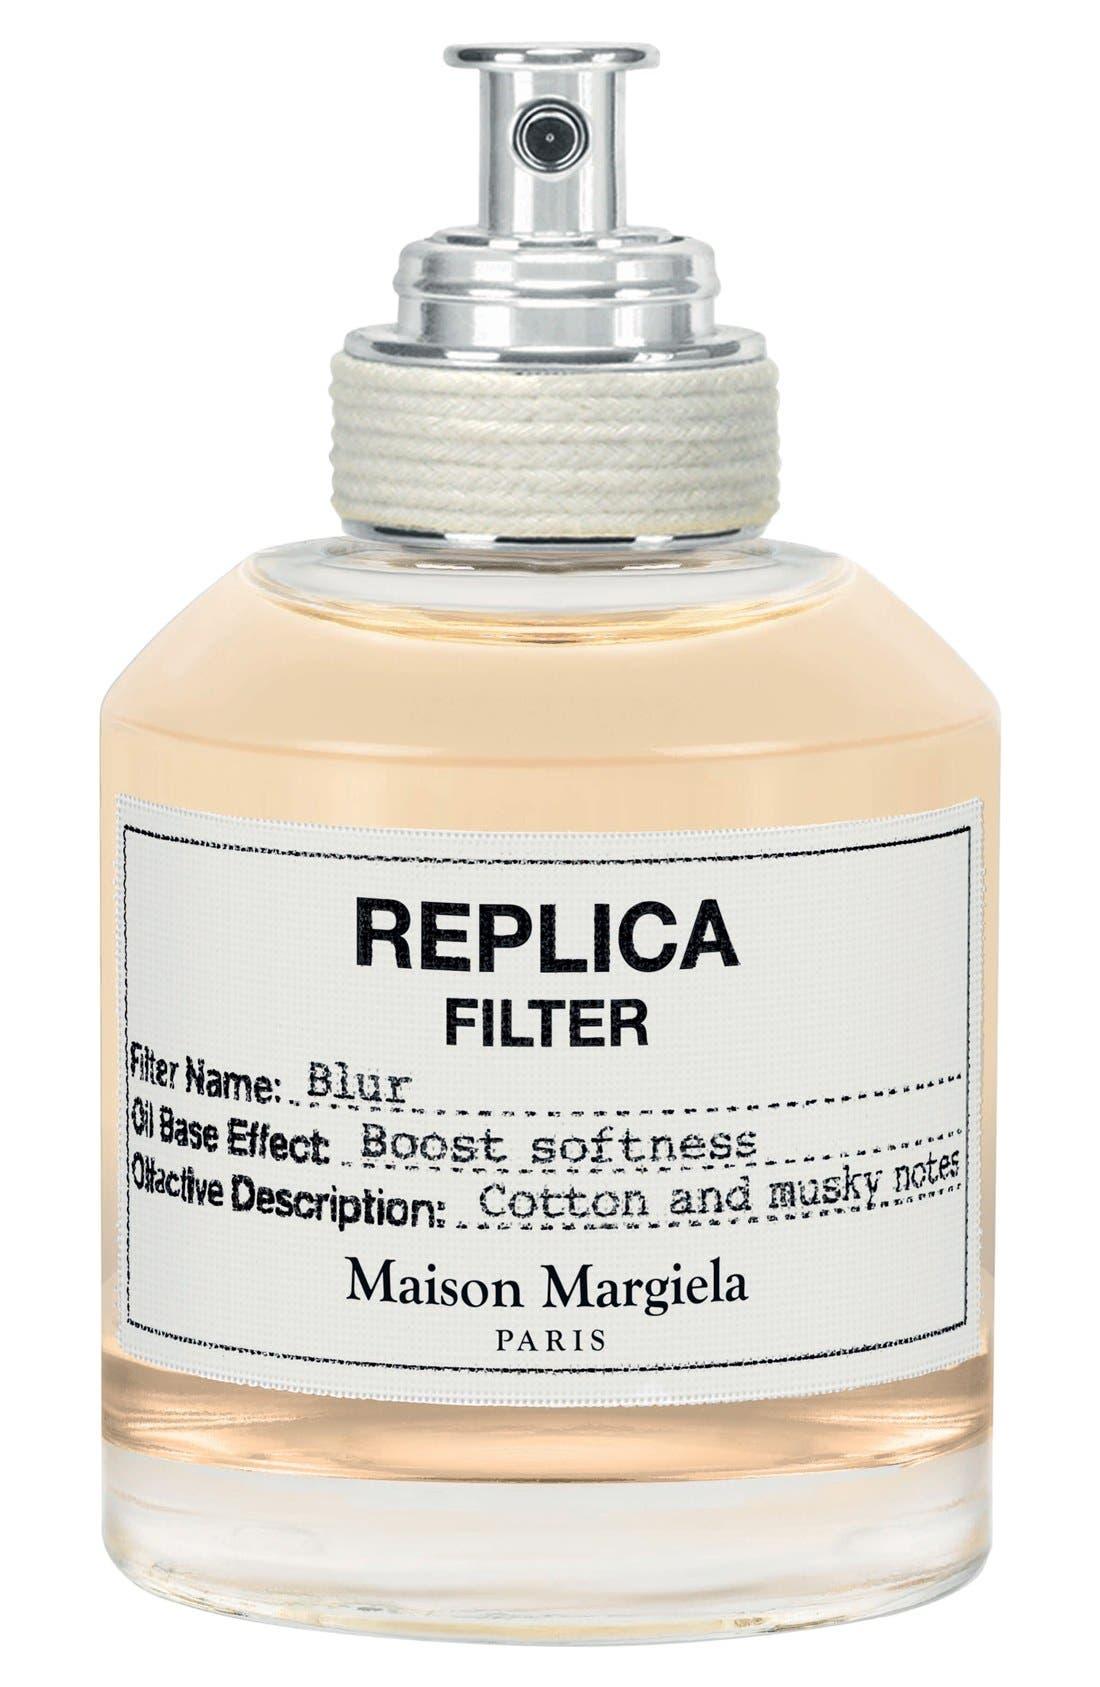 MAISON MARGIELA Replica Filter Blur Fragrance Primer, Main, color, NO COLOR